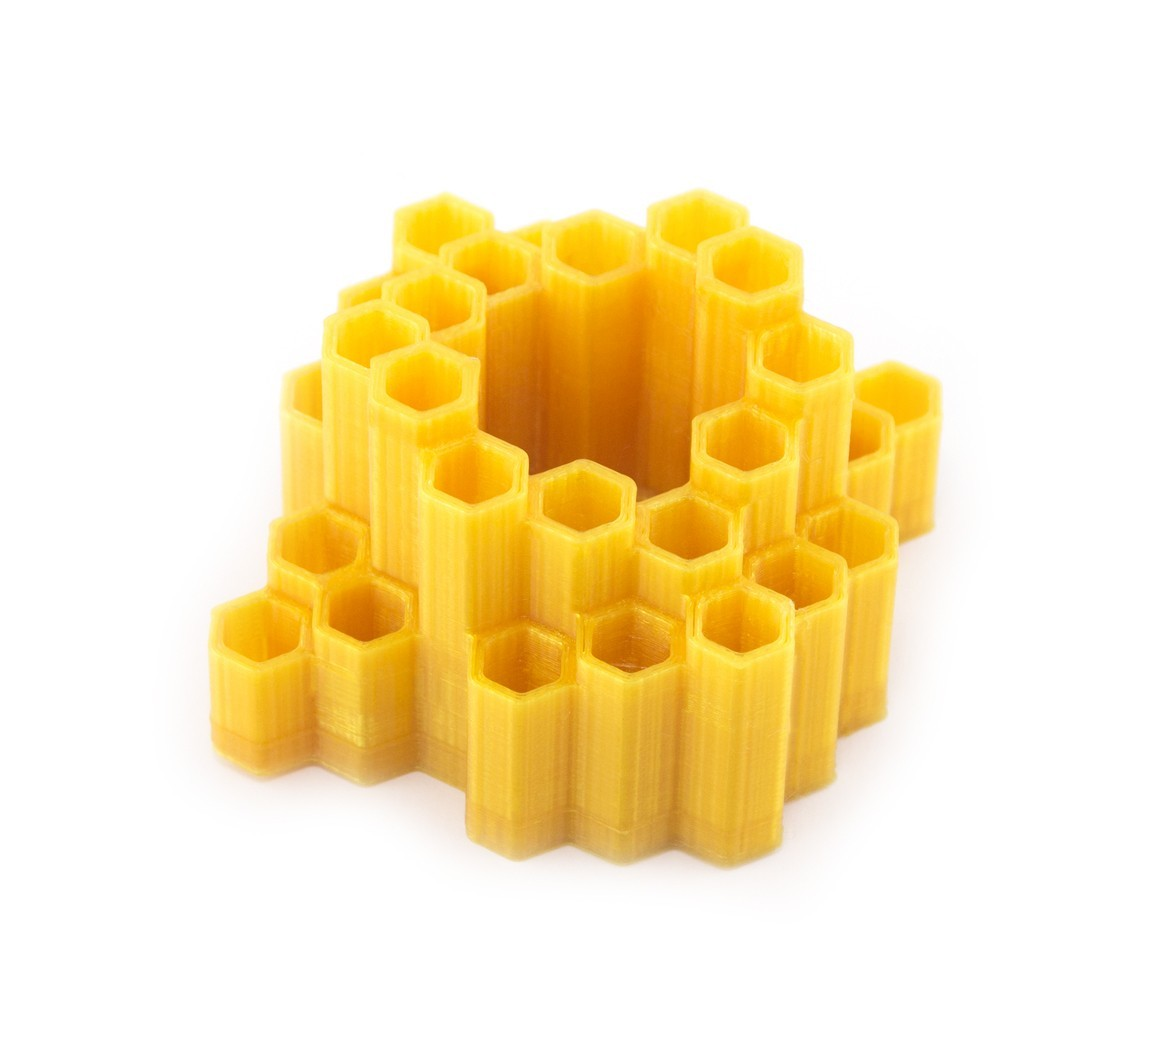 210367df949ca690fe7a9479b1862815_1452537395595_01.07.15-product-shoot-060.jpg Download free STL file Honeycomb Cup • 3D print model, Terryyy